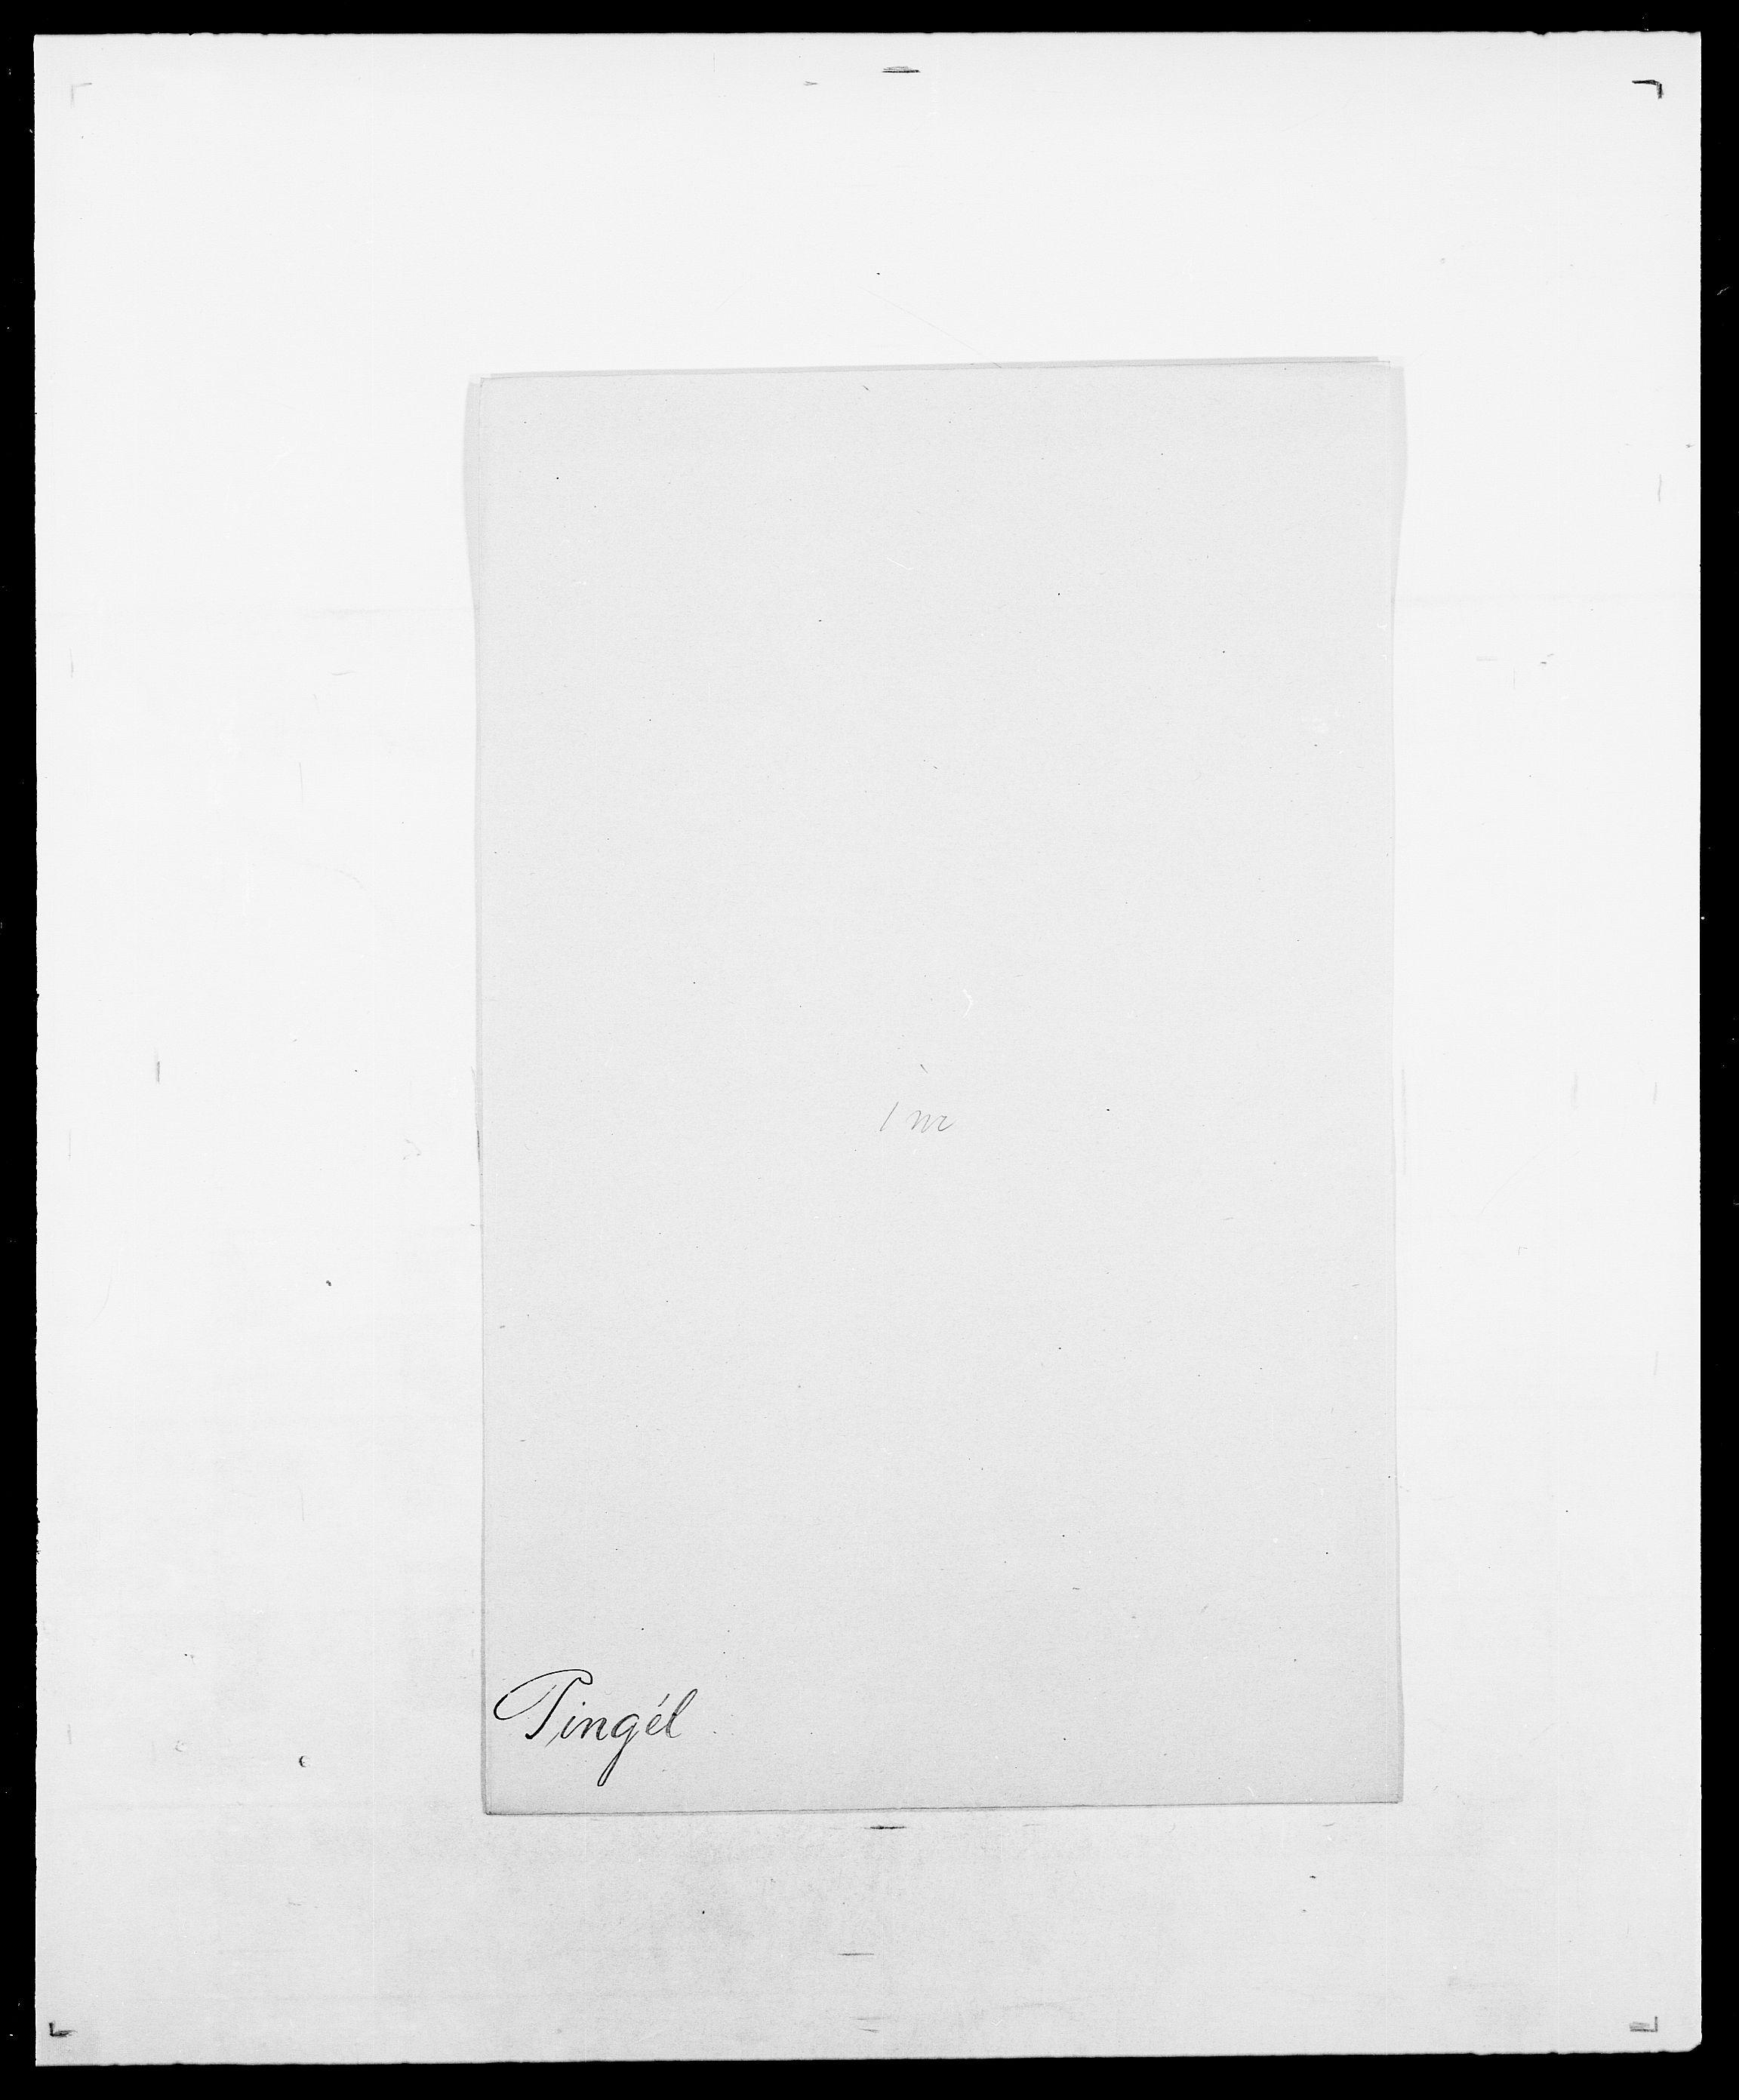 SAO, Delgobe, Charles Antoine - samling, D/Da/L0030: Paars - Pittelkov, s. 557